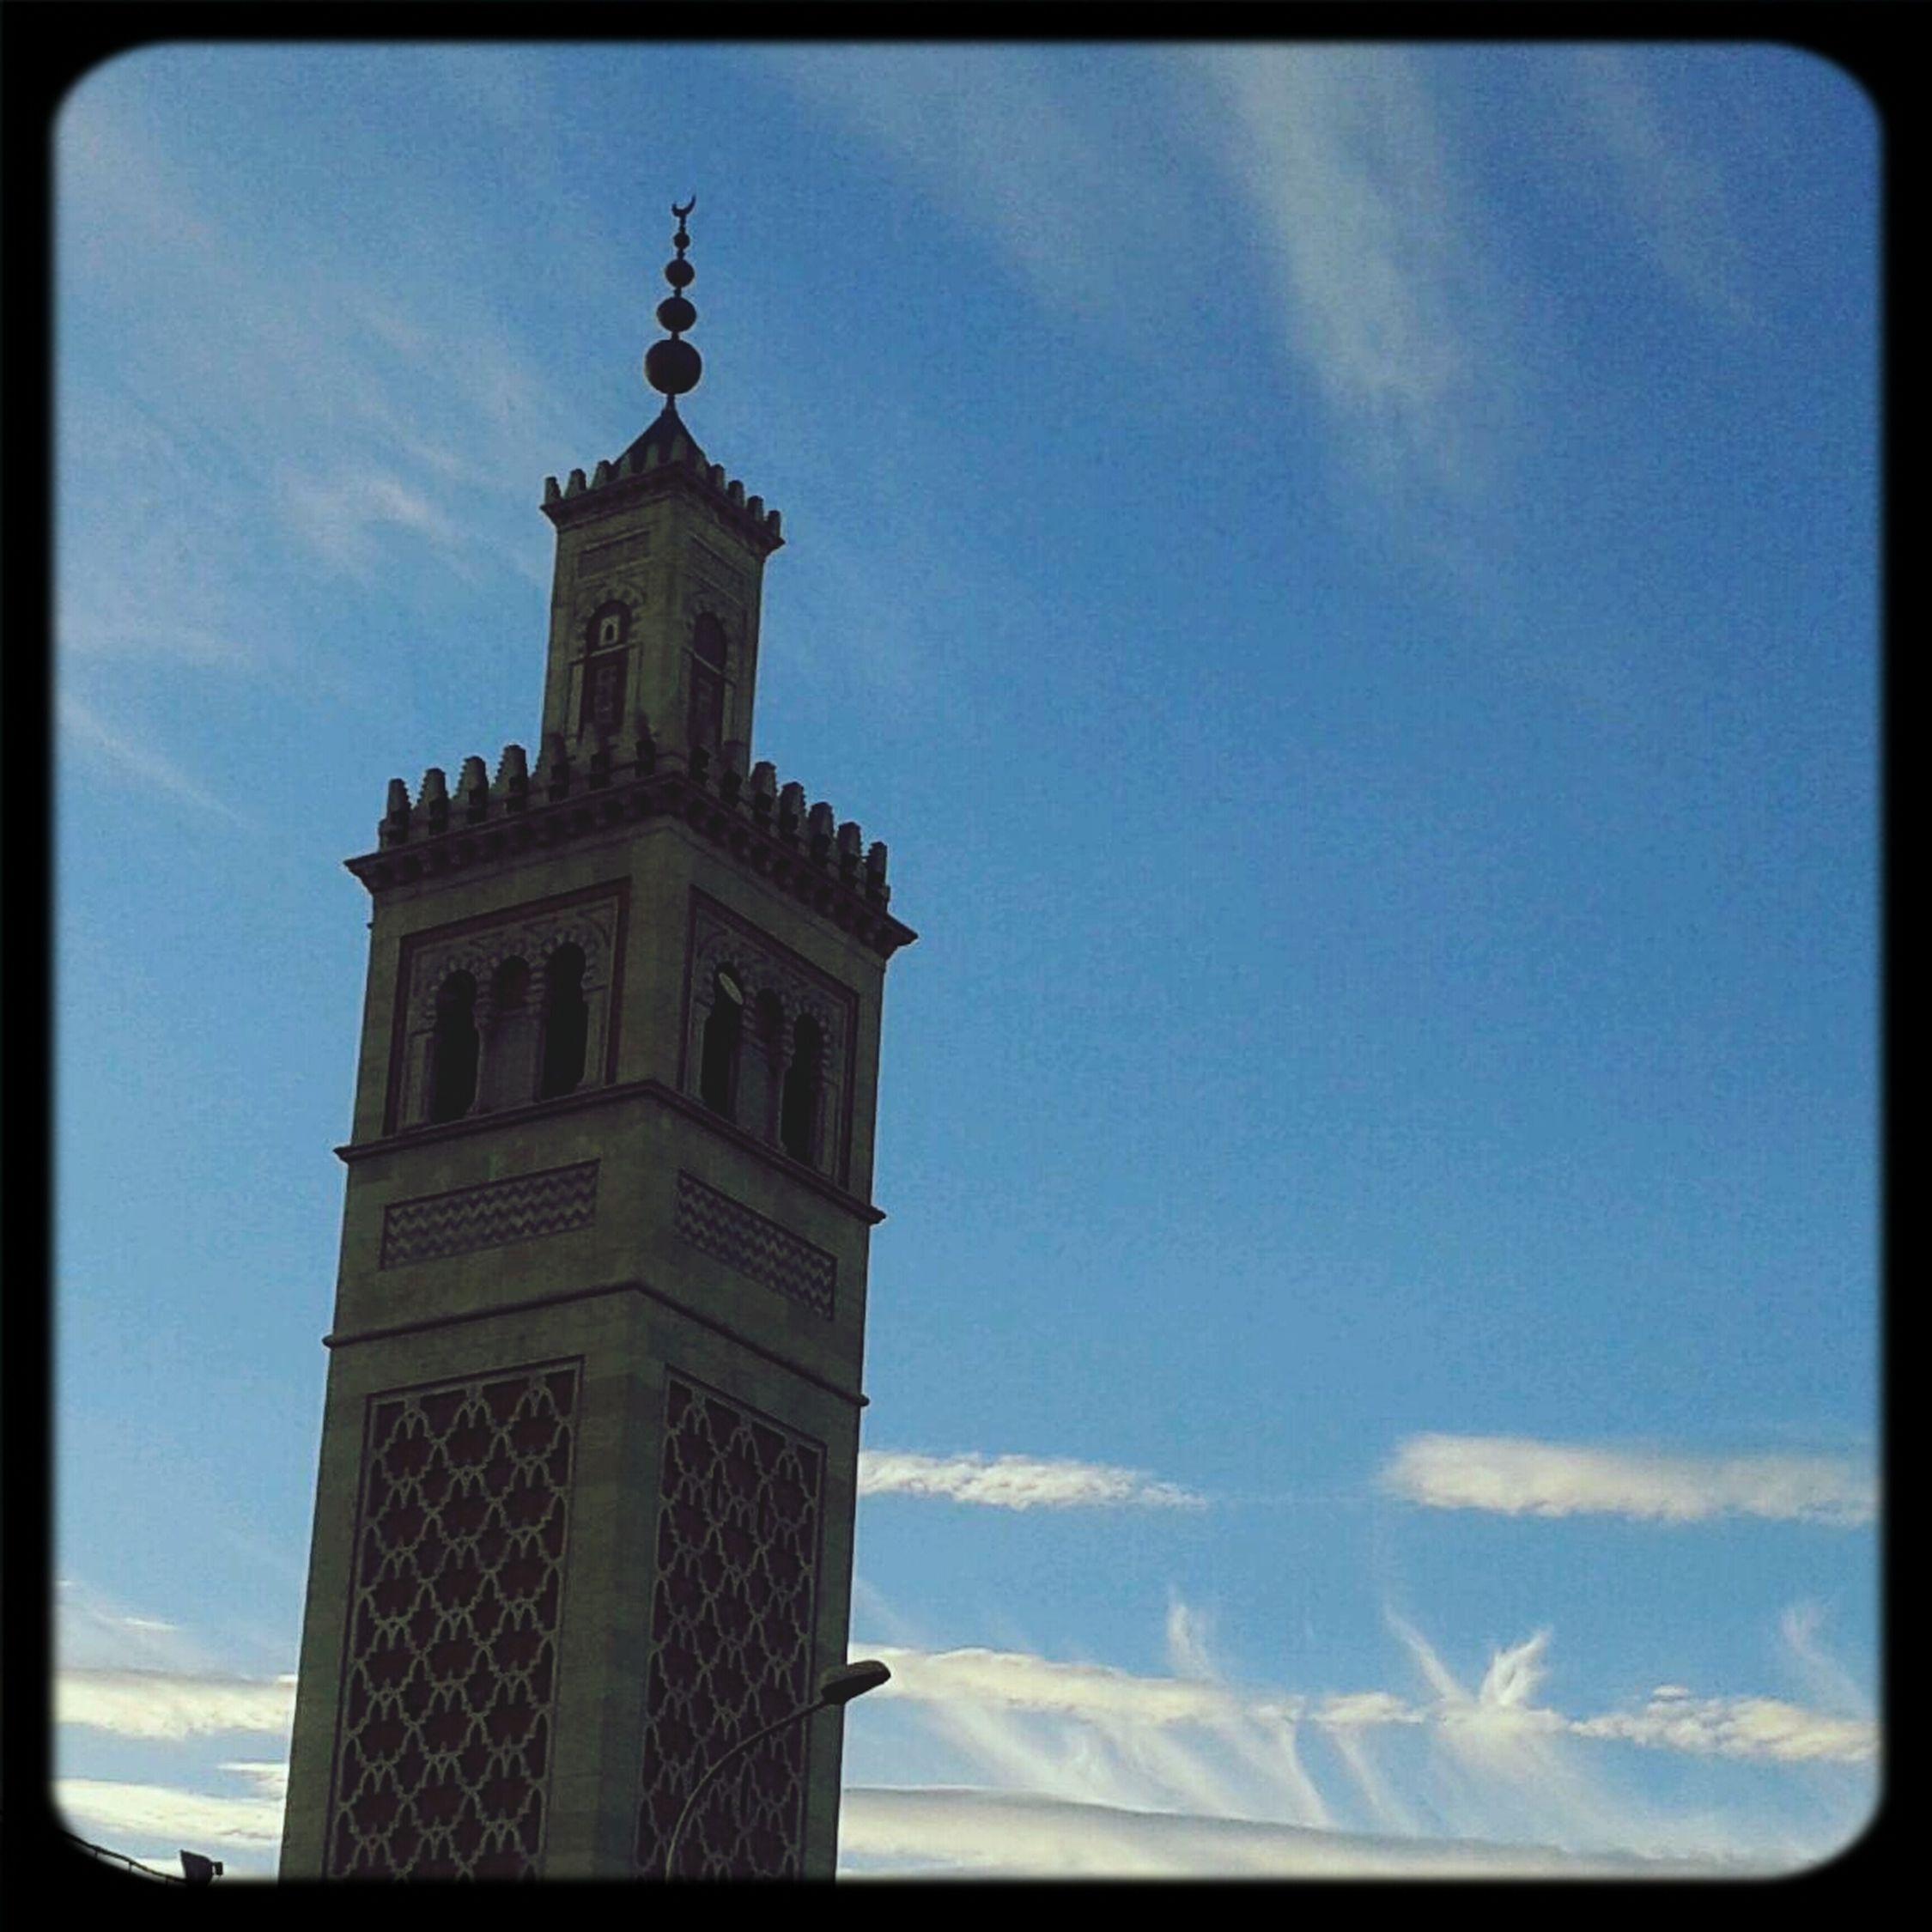 Mosque sidi bechir Tunis Eyem Tunisia Eyemmedina tunisia